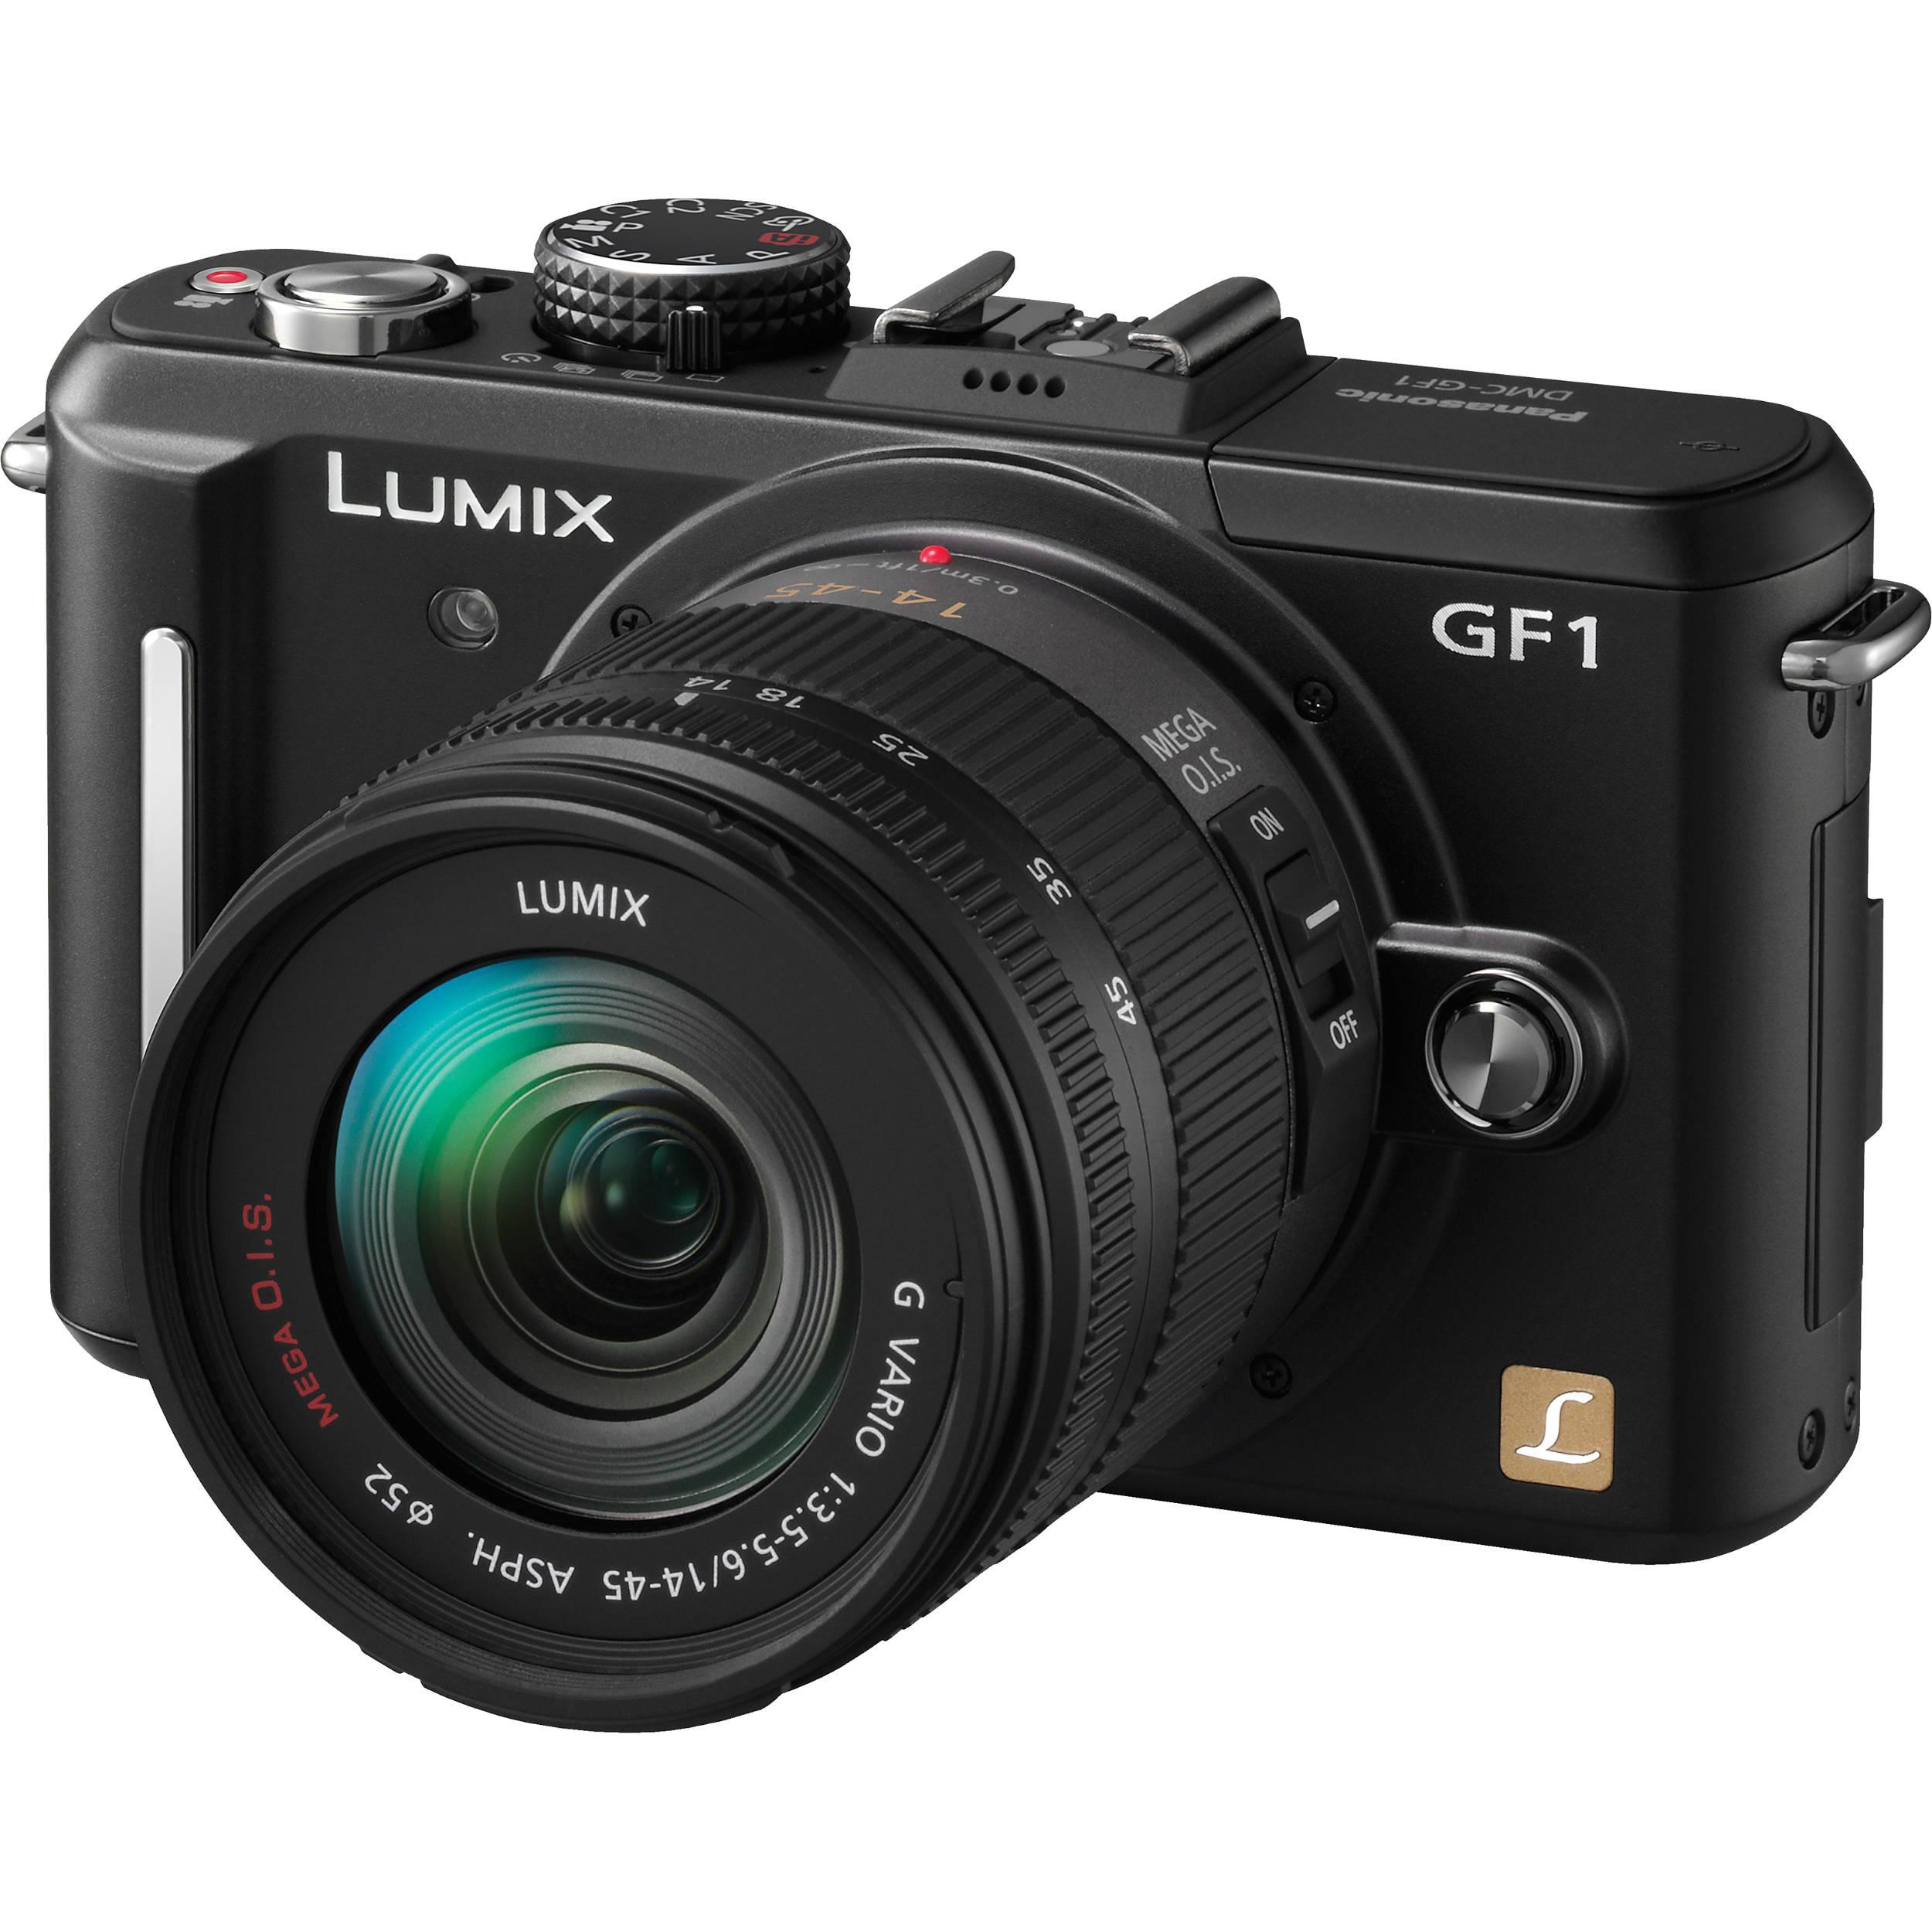 Panasonic Lumix DMC-GF1 Digital Camera with 14-45mm DMC-GF1K-K